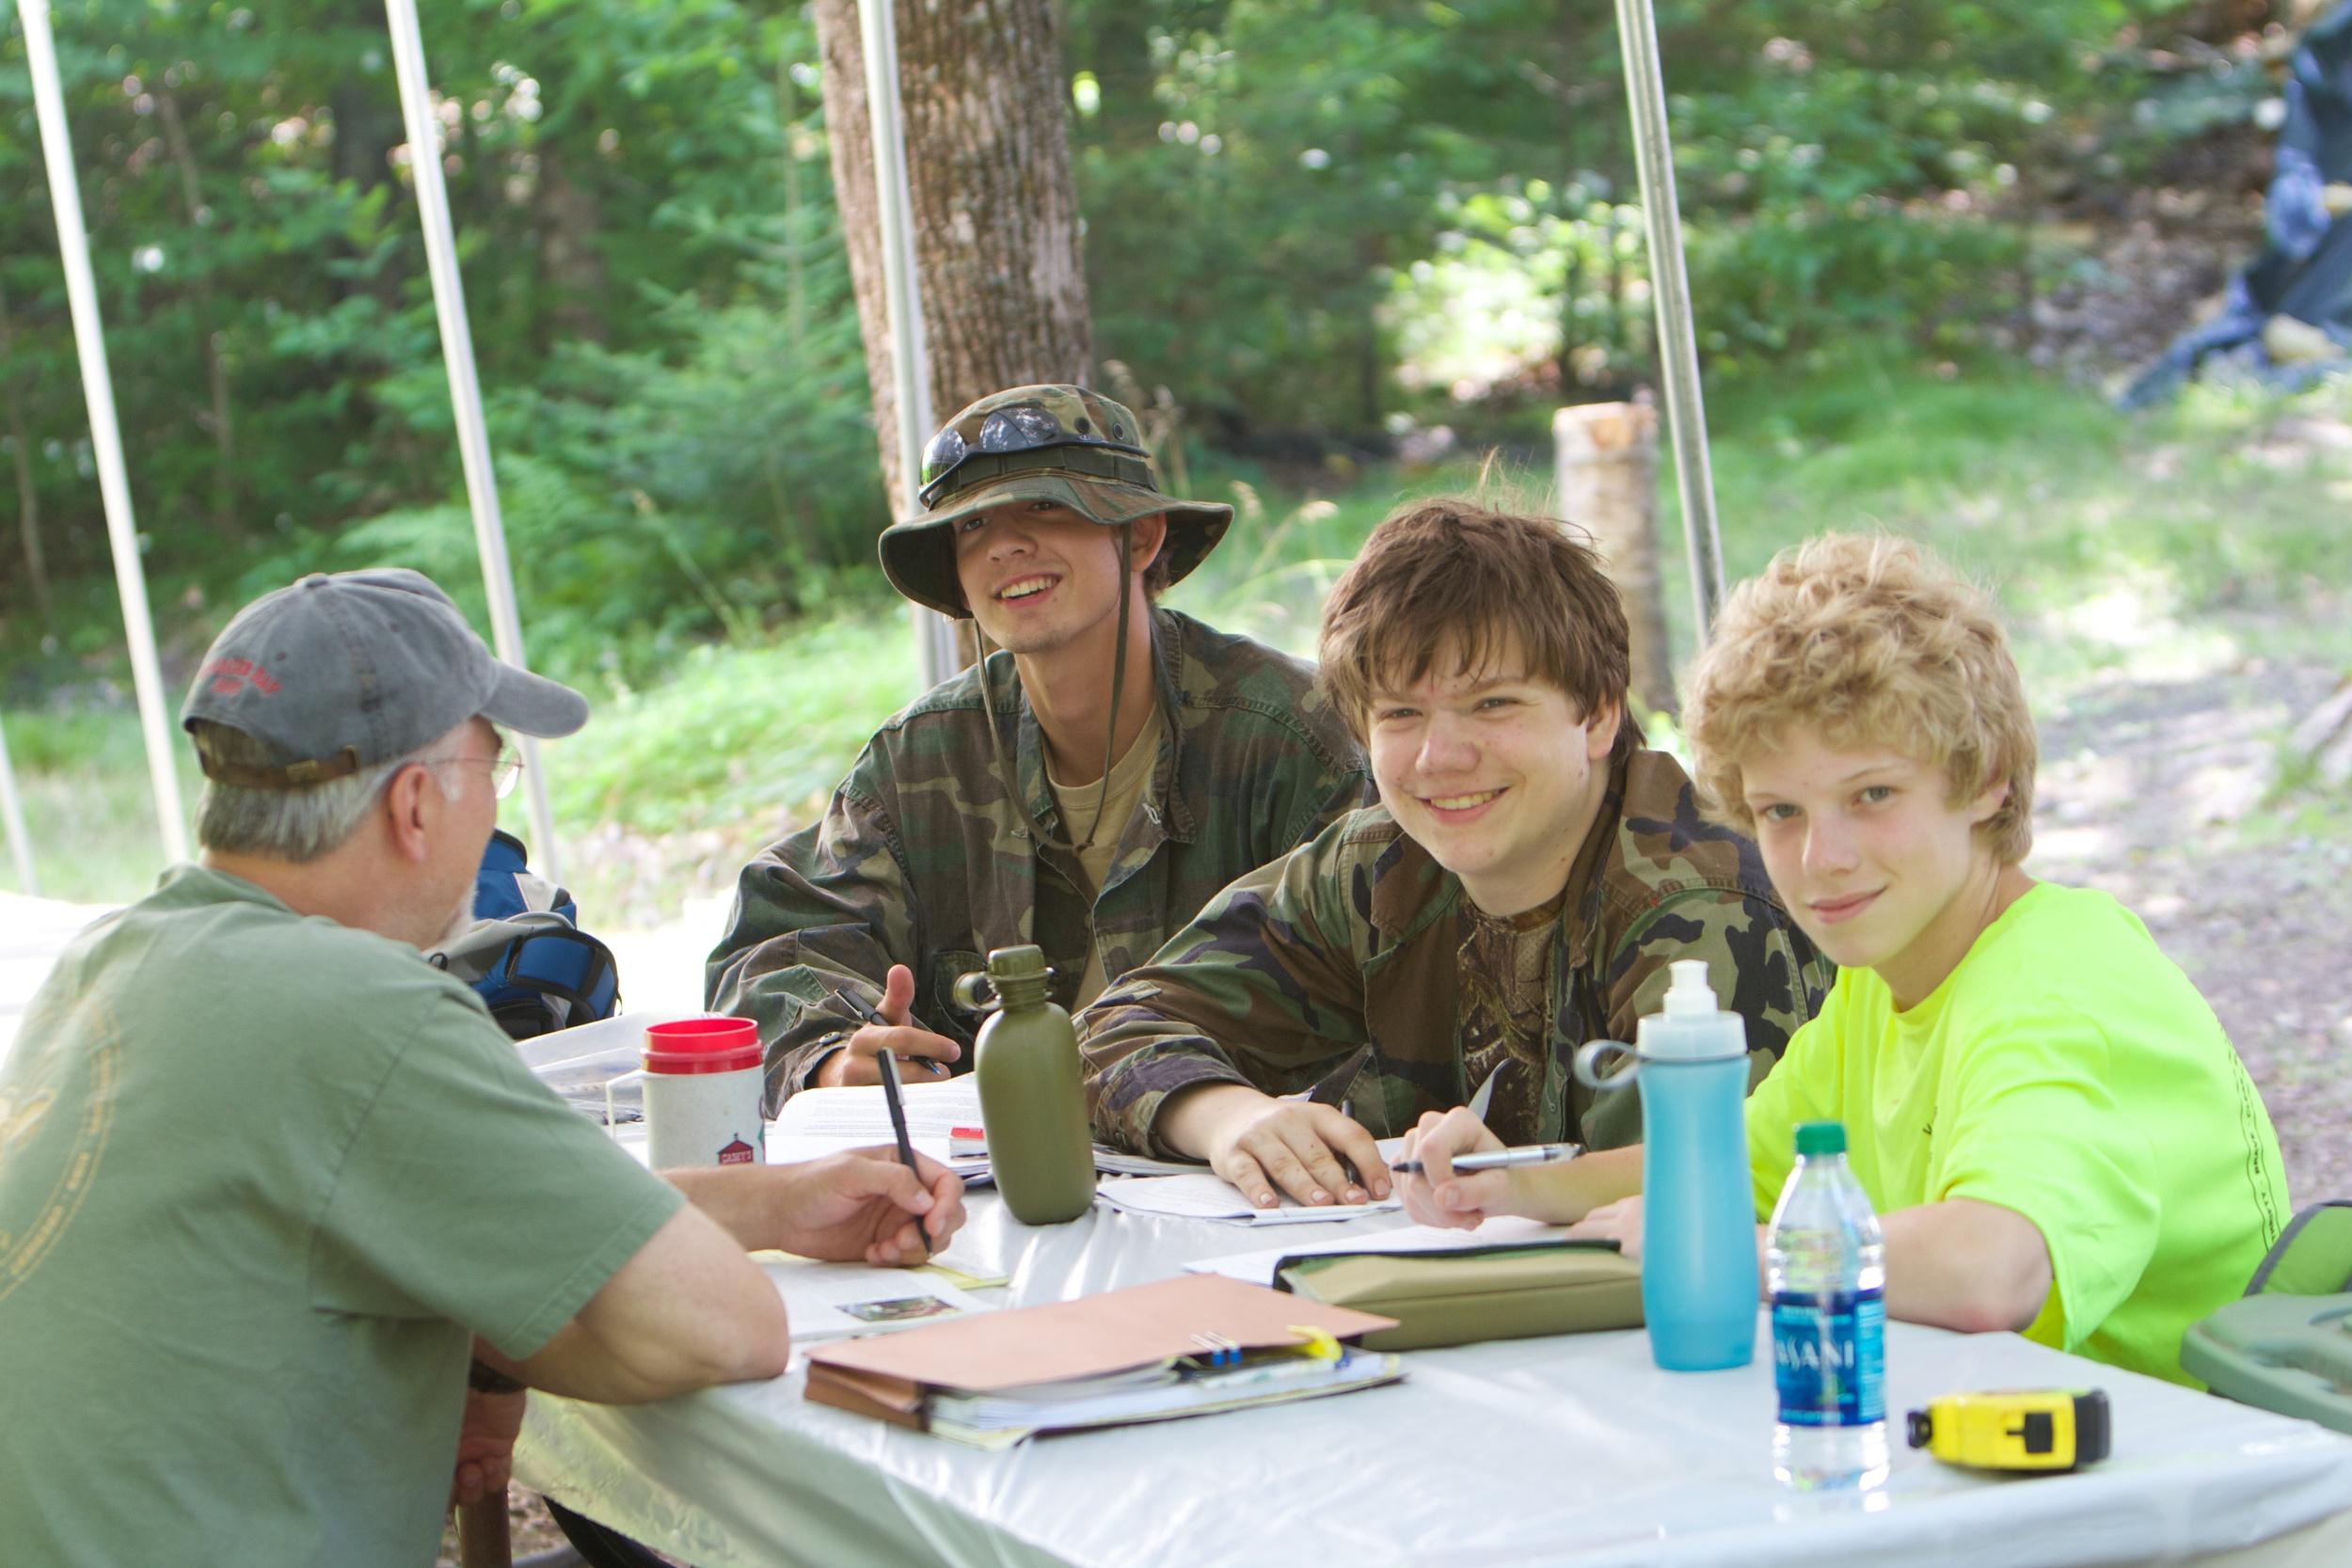 2014 Camp 2 362014 Camp 2 69IMG_0069.jpg